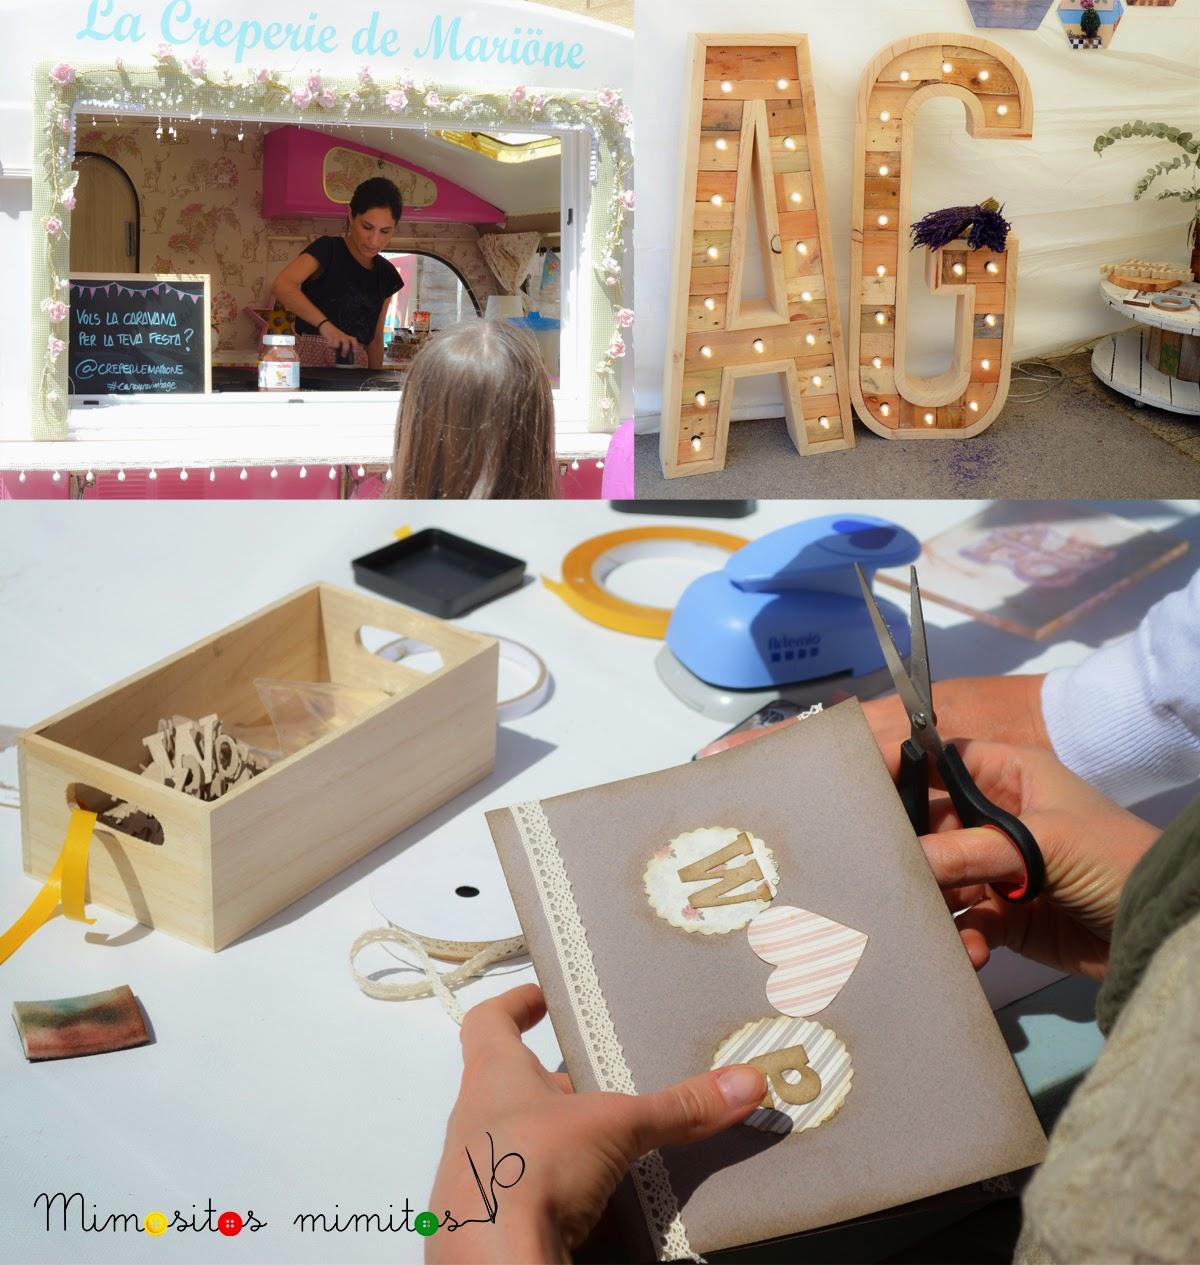 Handmade Festival Barcelona 2014 hecho a mano craft DIY manualidades Fira BCN mercadillo feria artesanal